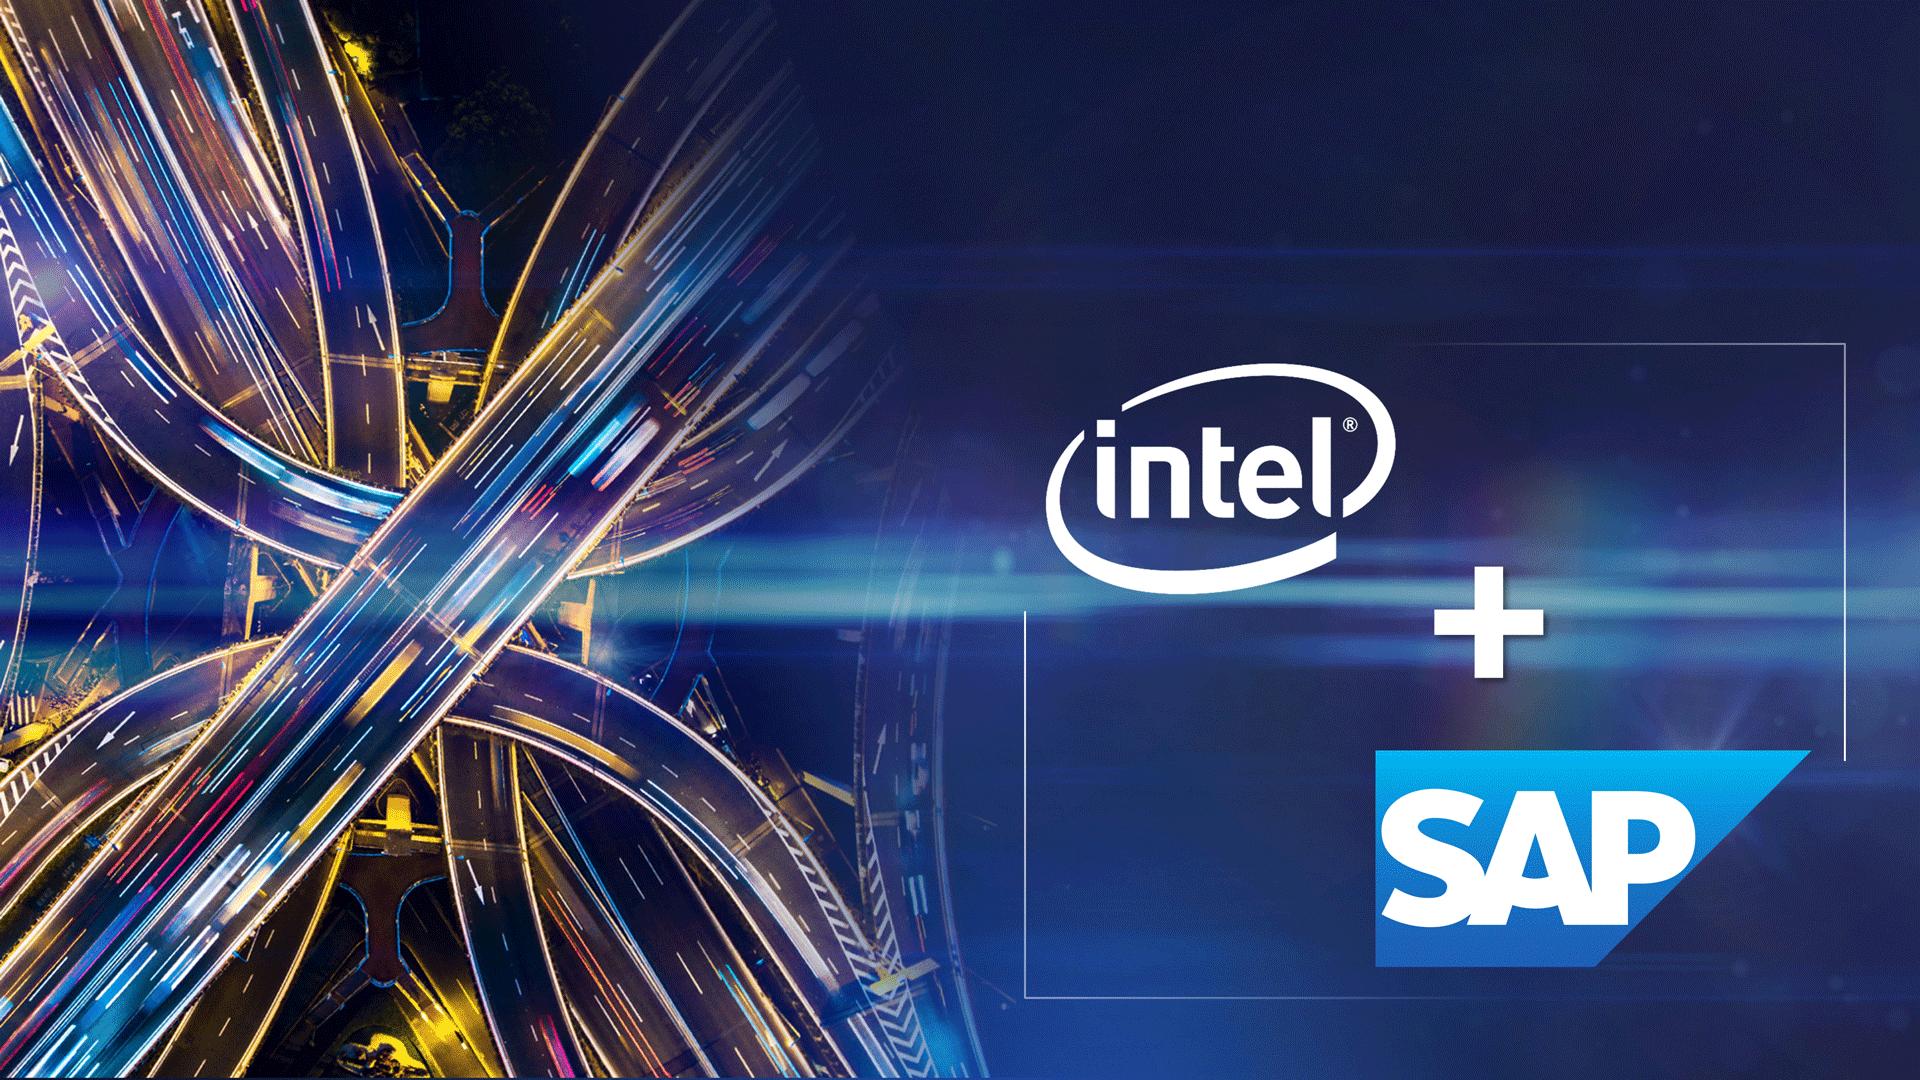 Intel SAP Partnership Announcement